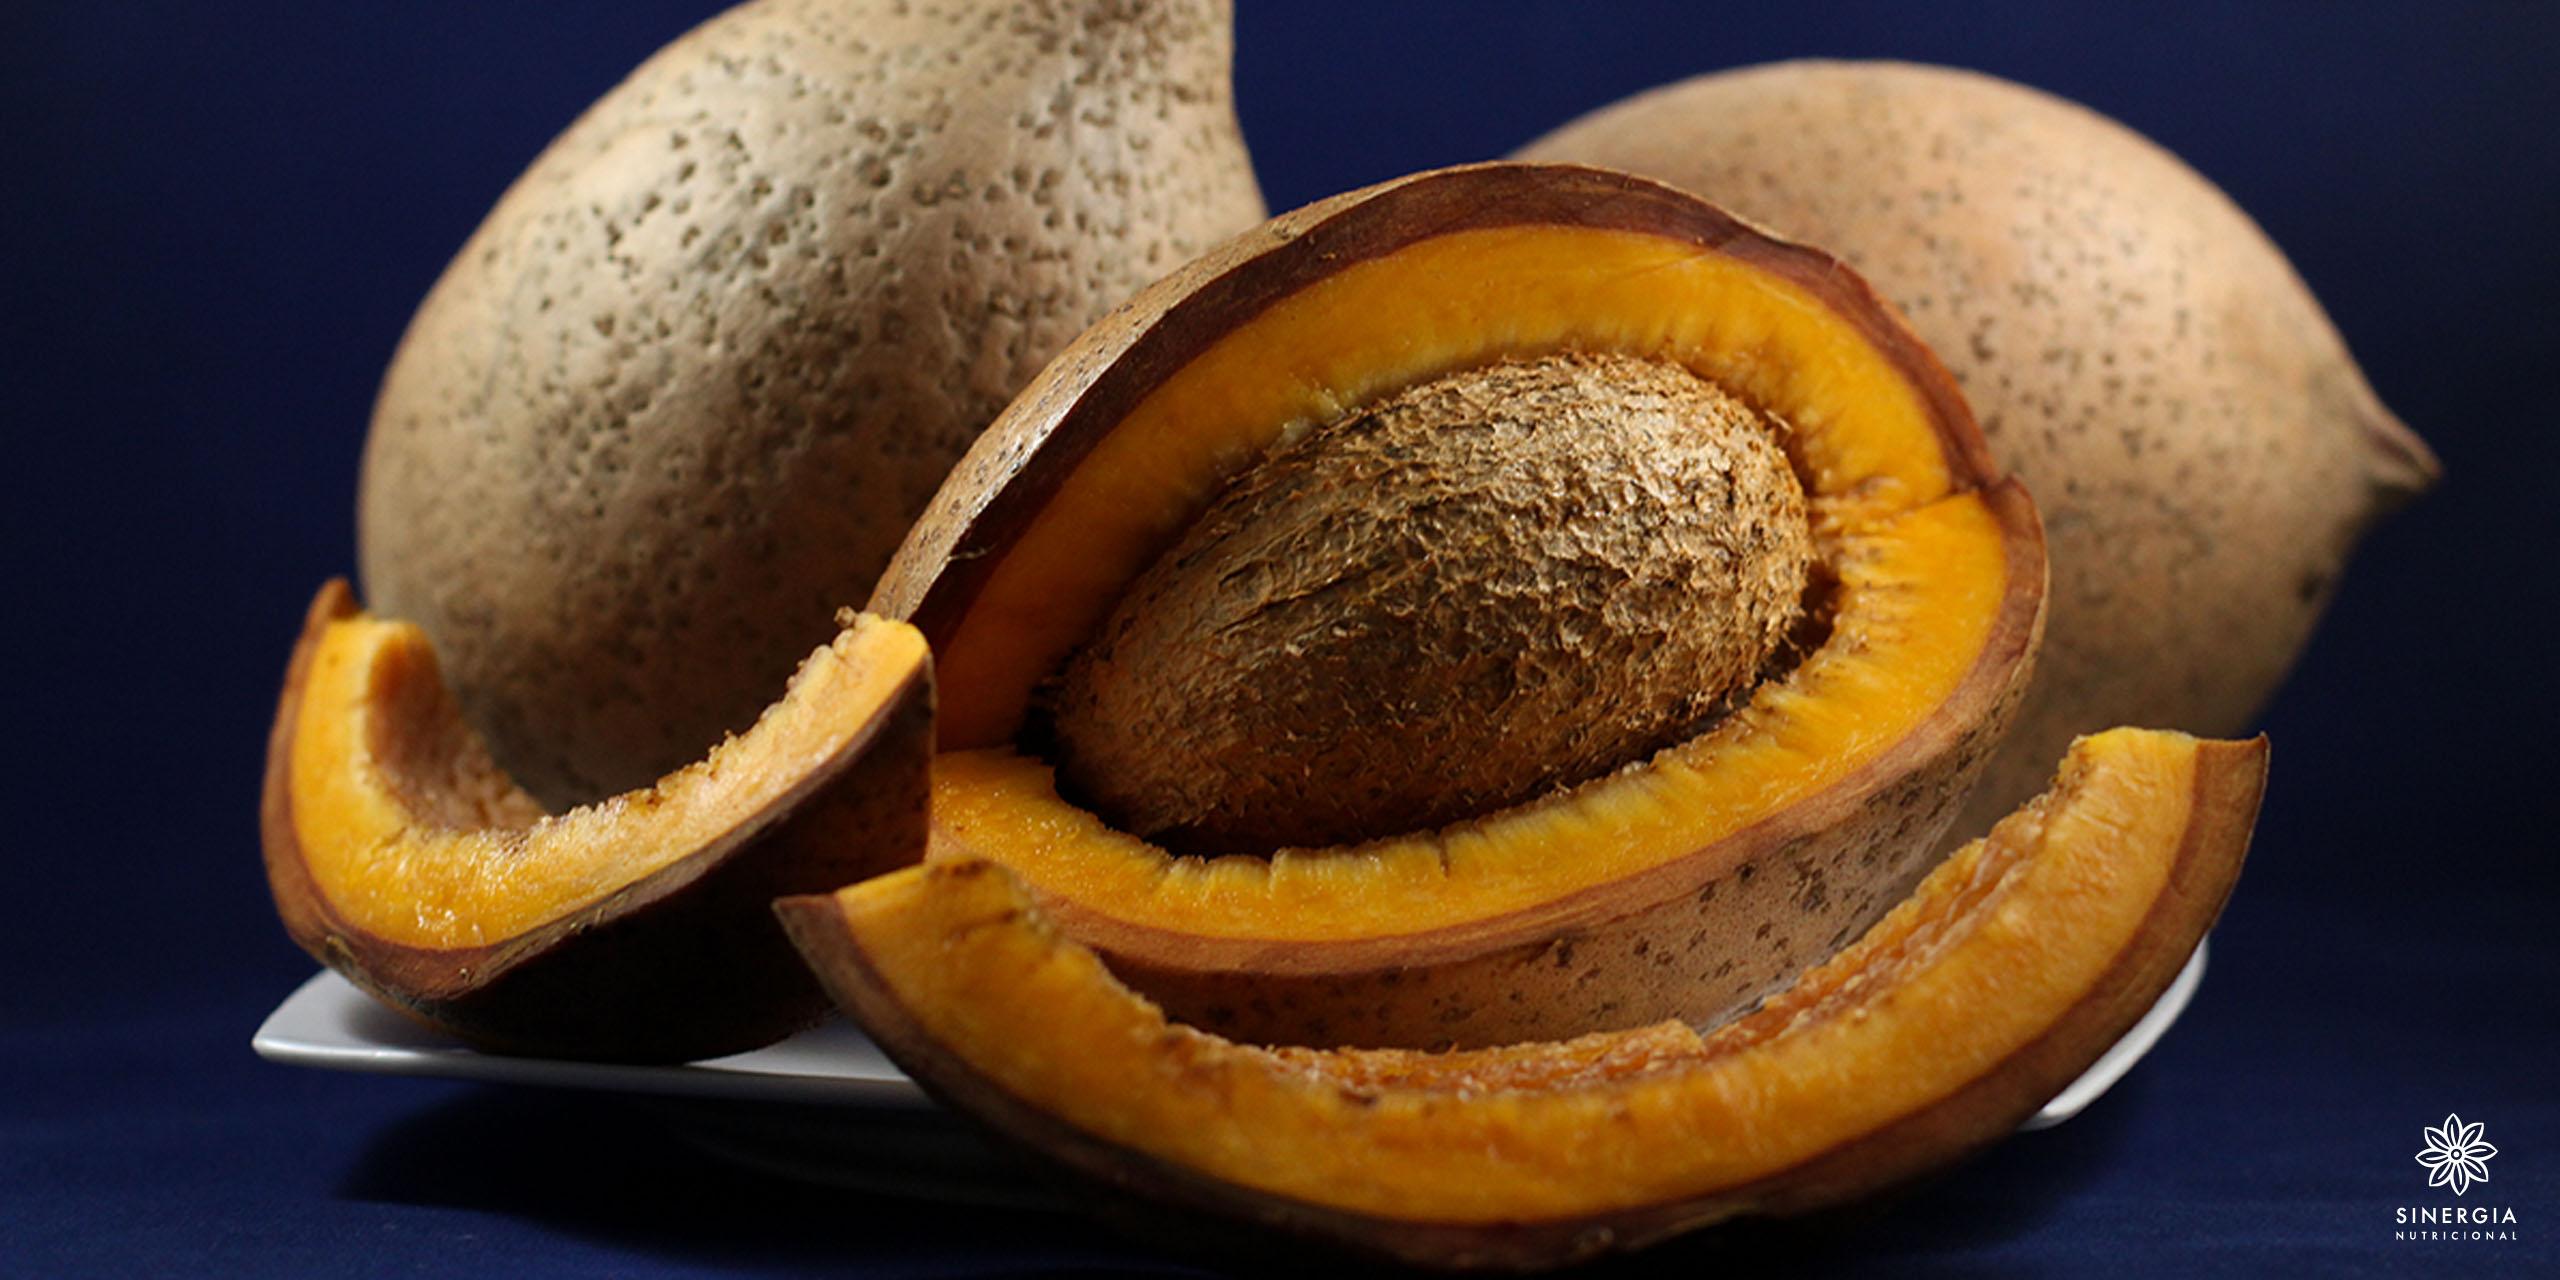 El Mamey: una fruta medicinal